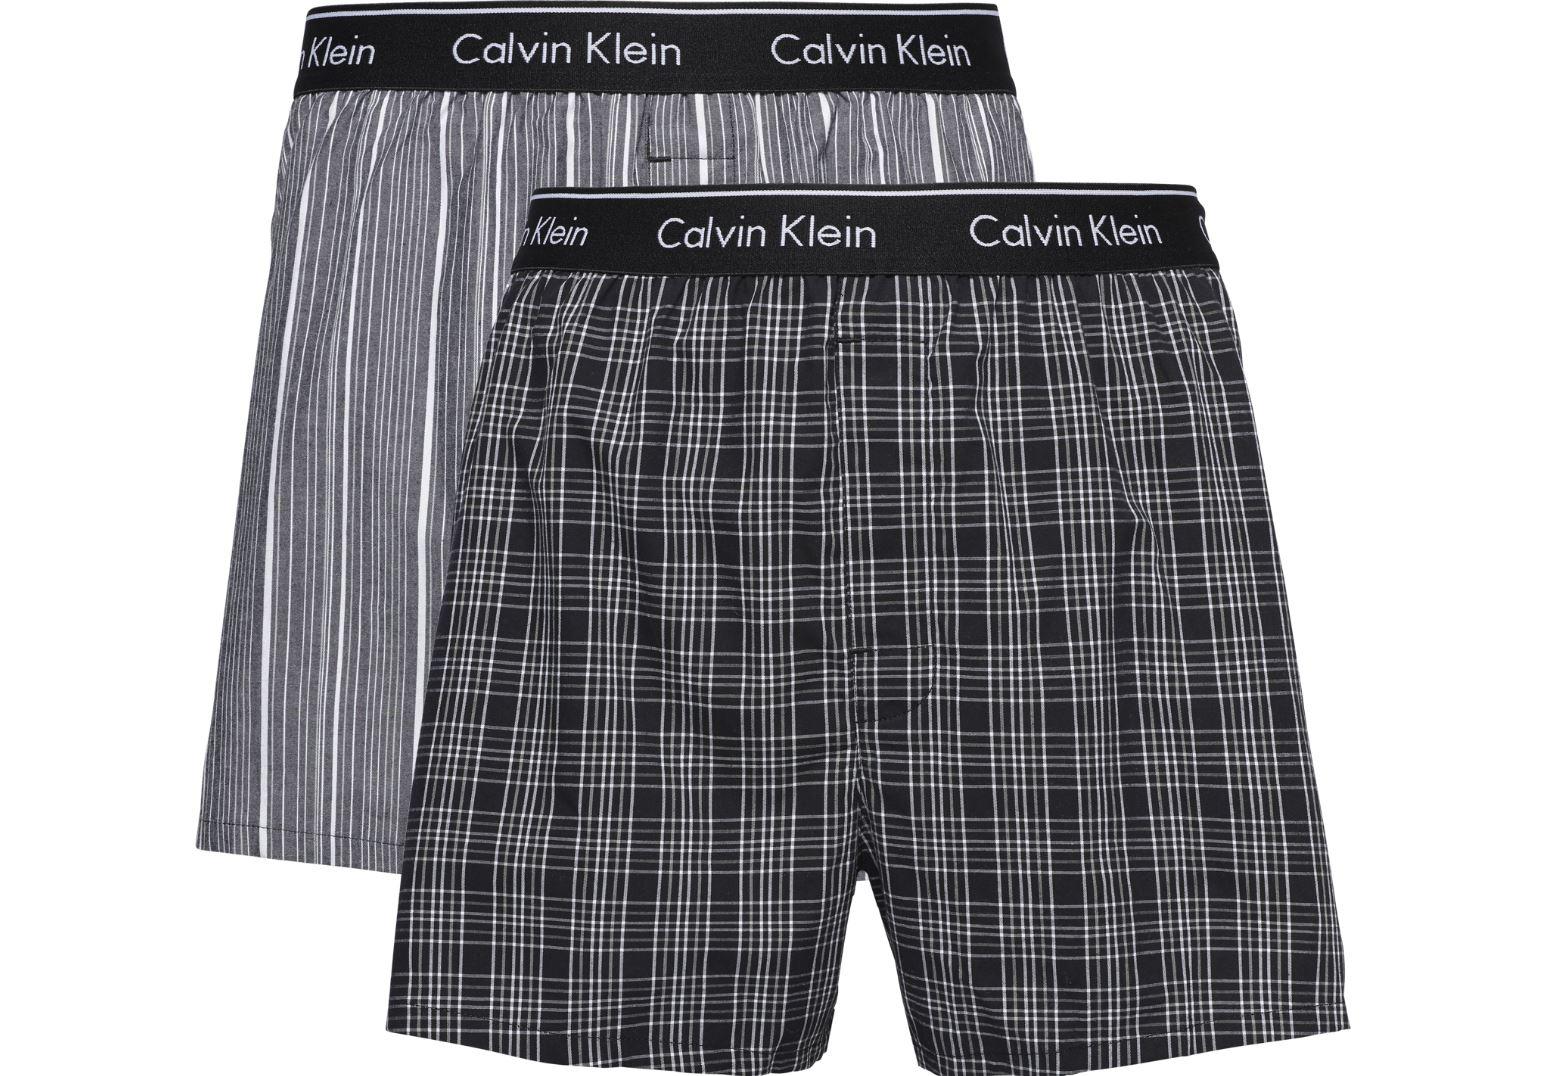 6717b898b2 Calvin Klein Mens 'Traditional' Woven Check Boxer Shorts (2-Pack ...